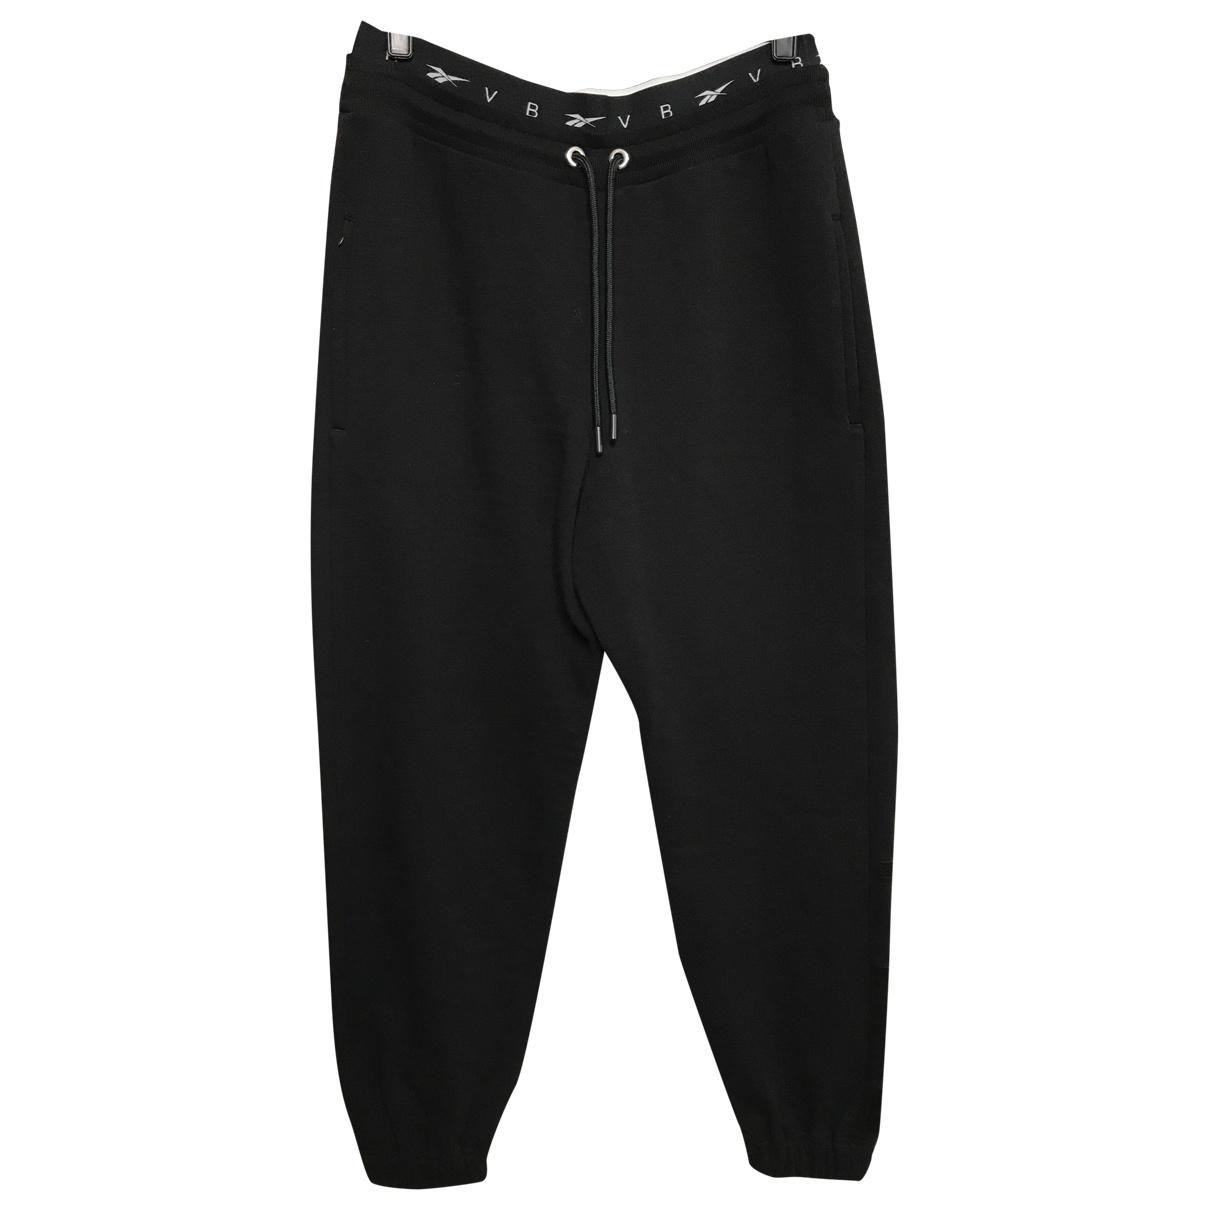 Reebok \N Black Cotton Trousers for Women M International